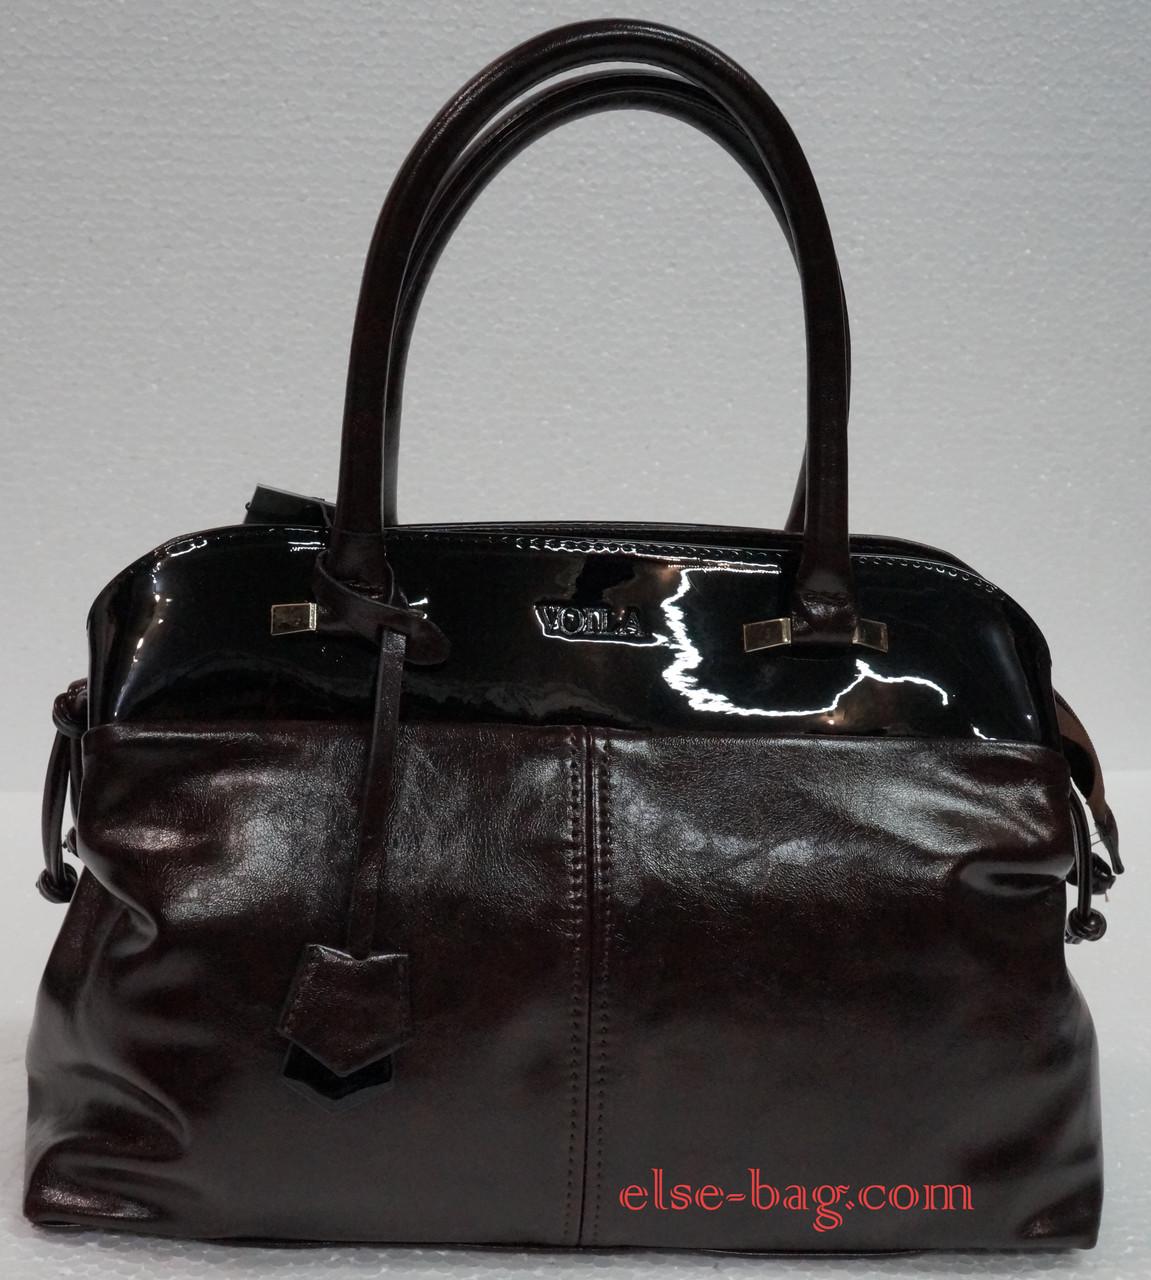 Женская сумка саквояж с кокеткой  продажа, цена в Харькове. женские ... 3ef592e8f1c